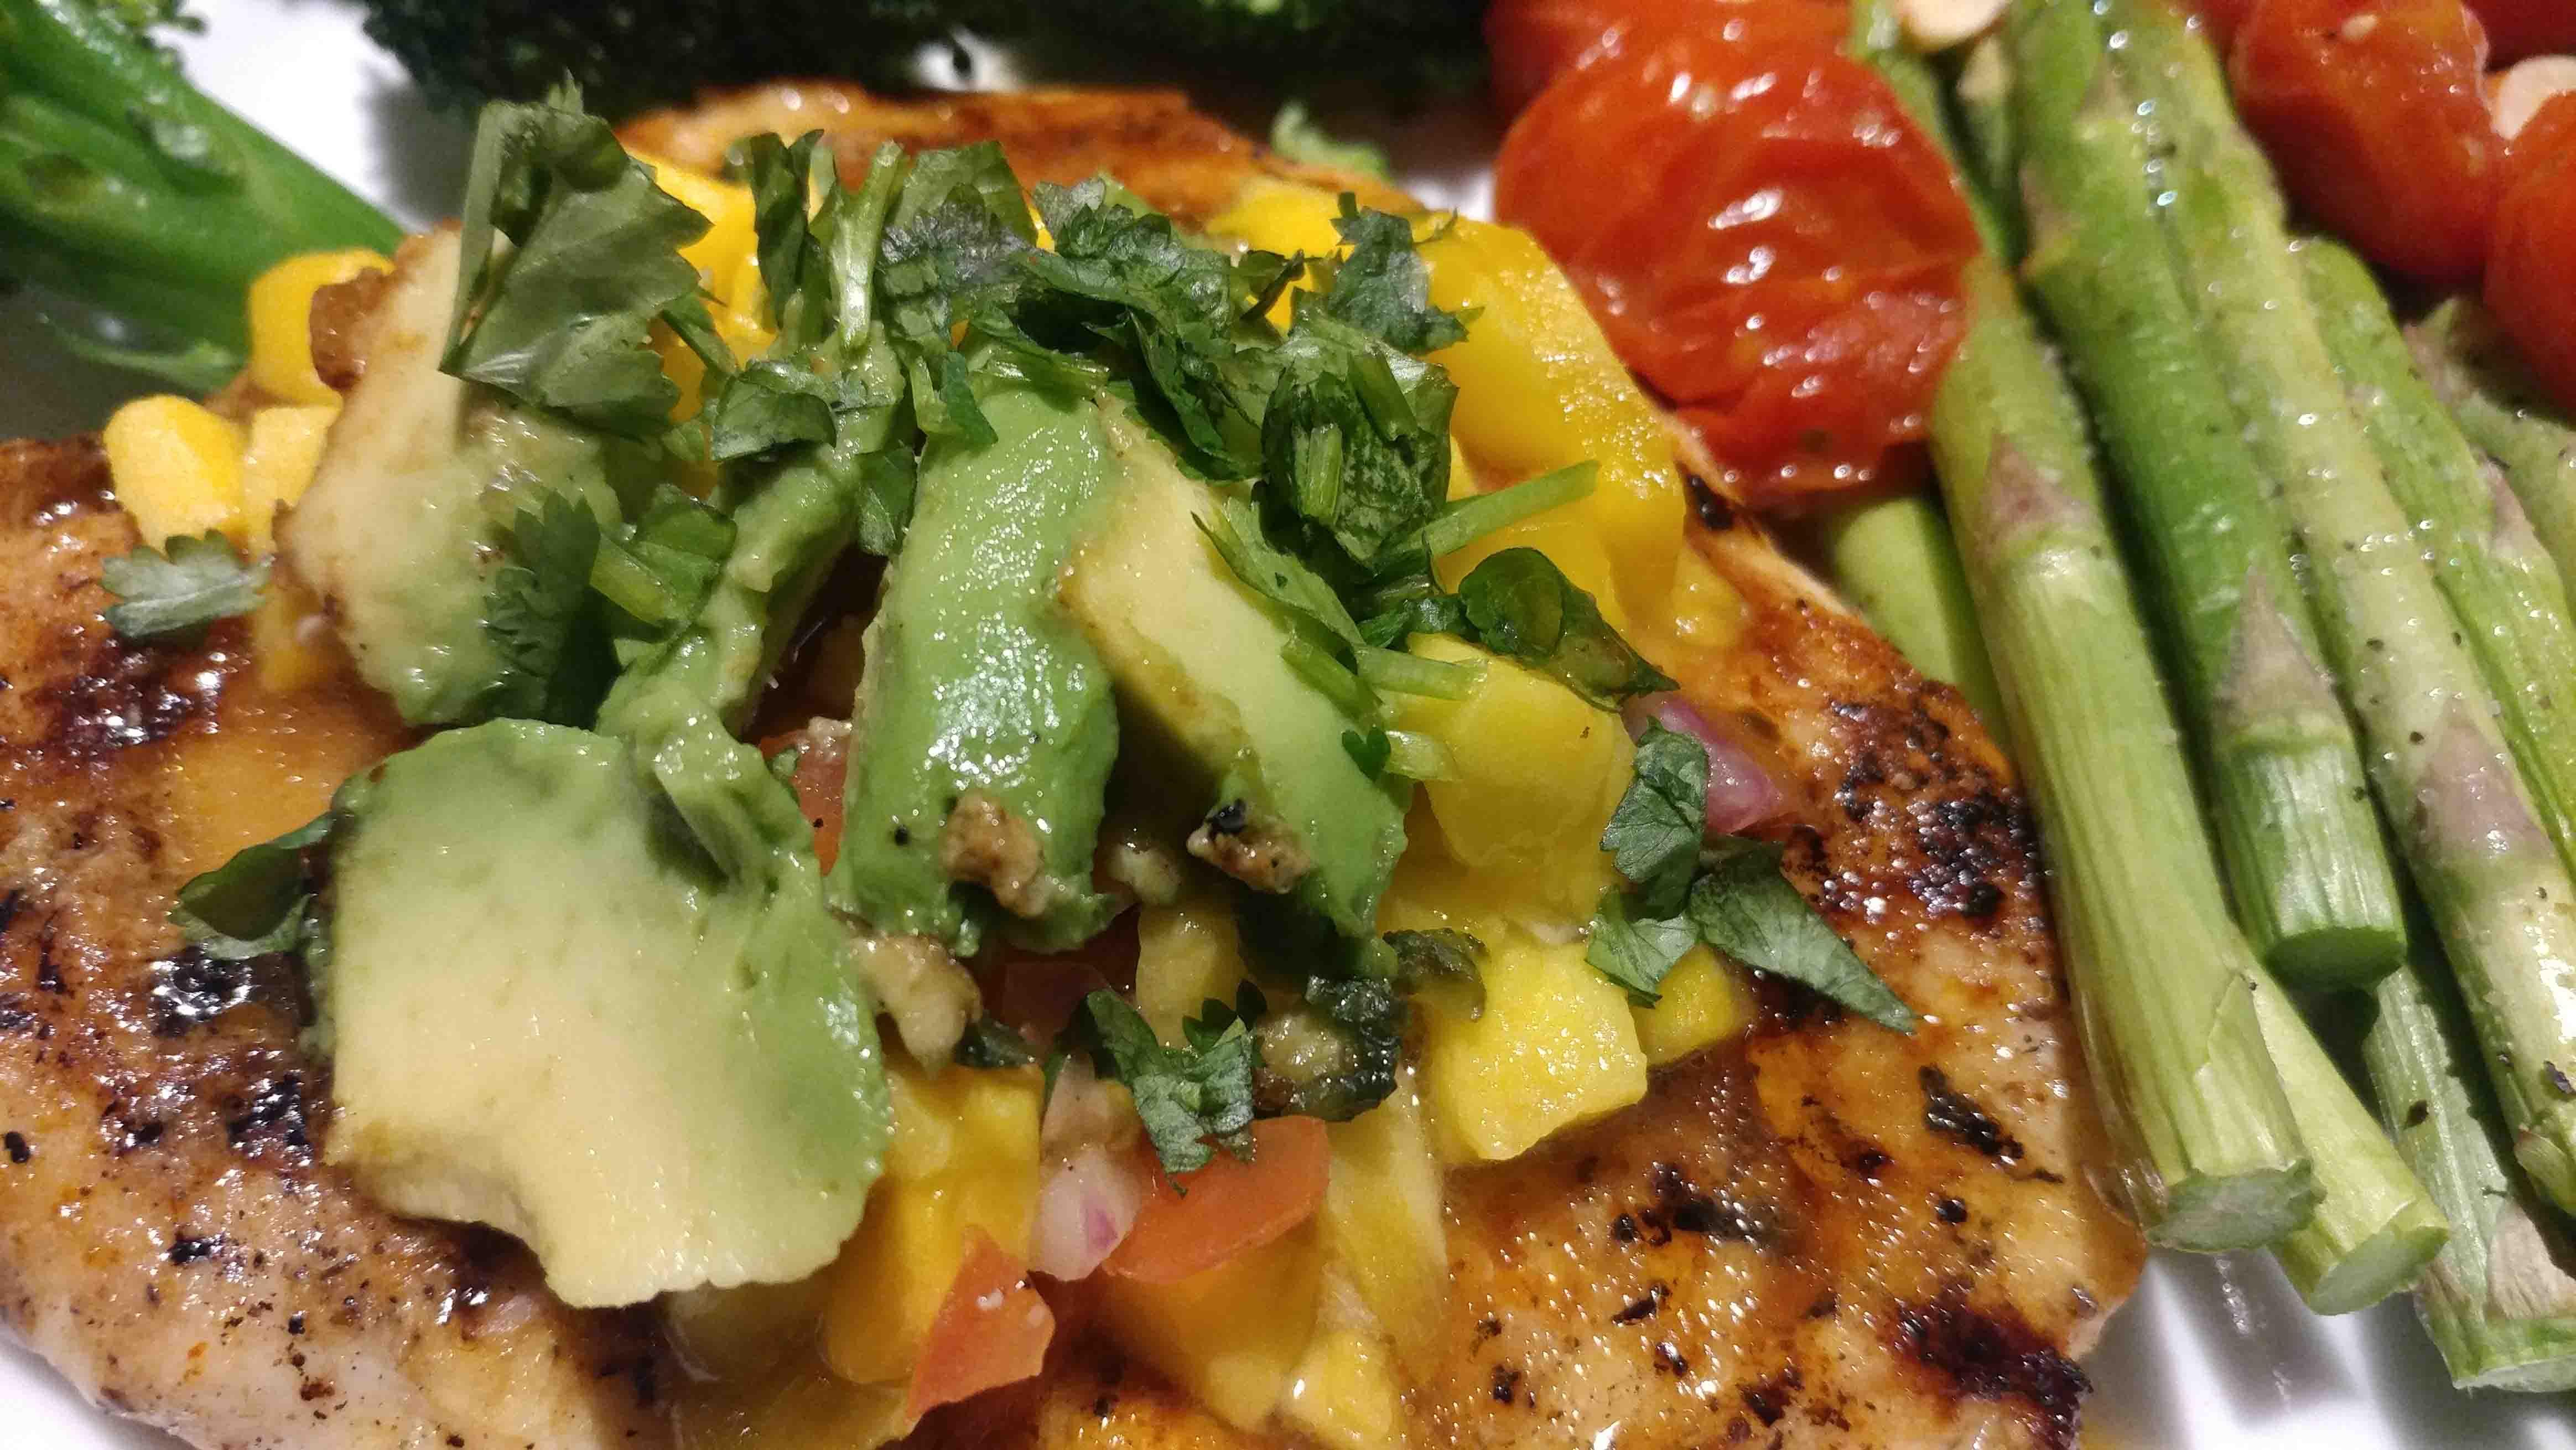 Copycat Chili S Mango Chili Chicken With Thai Chili Healthy Thai Recipes